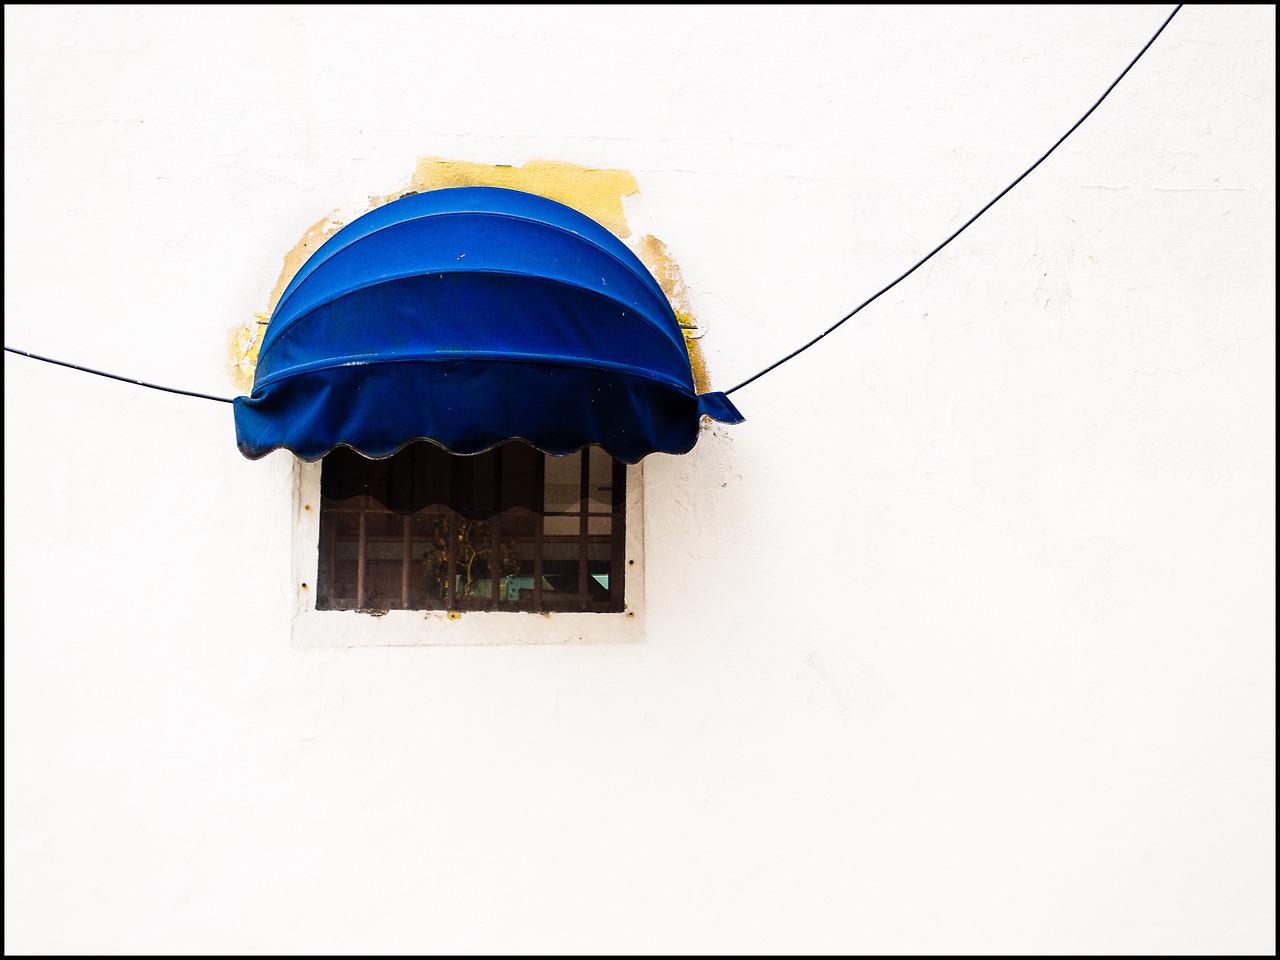 Untitled, 2013 Callan Tham